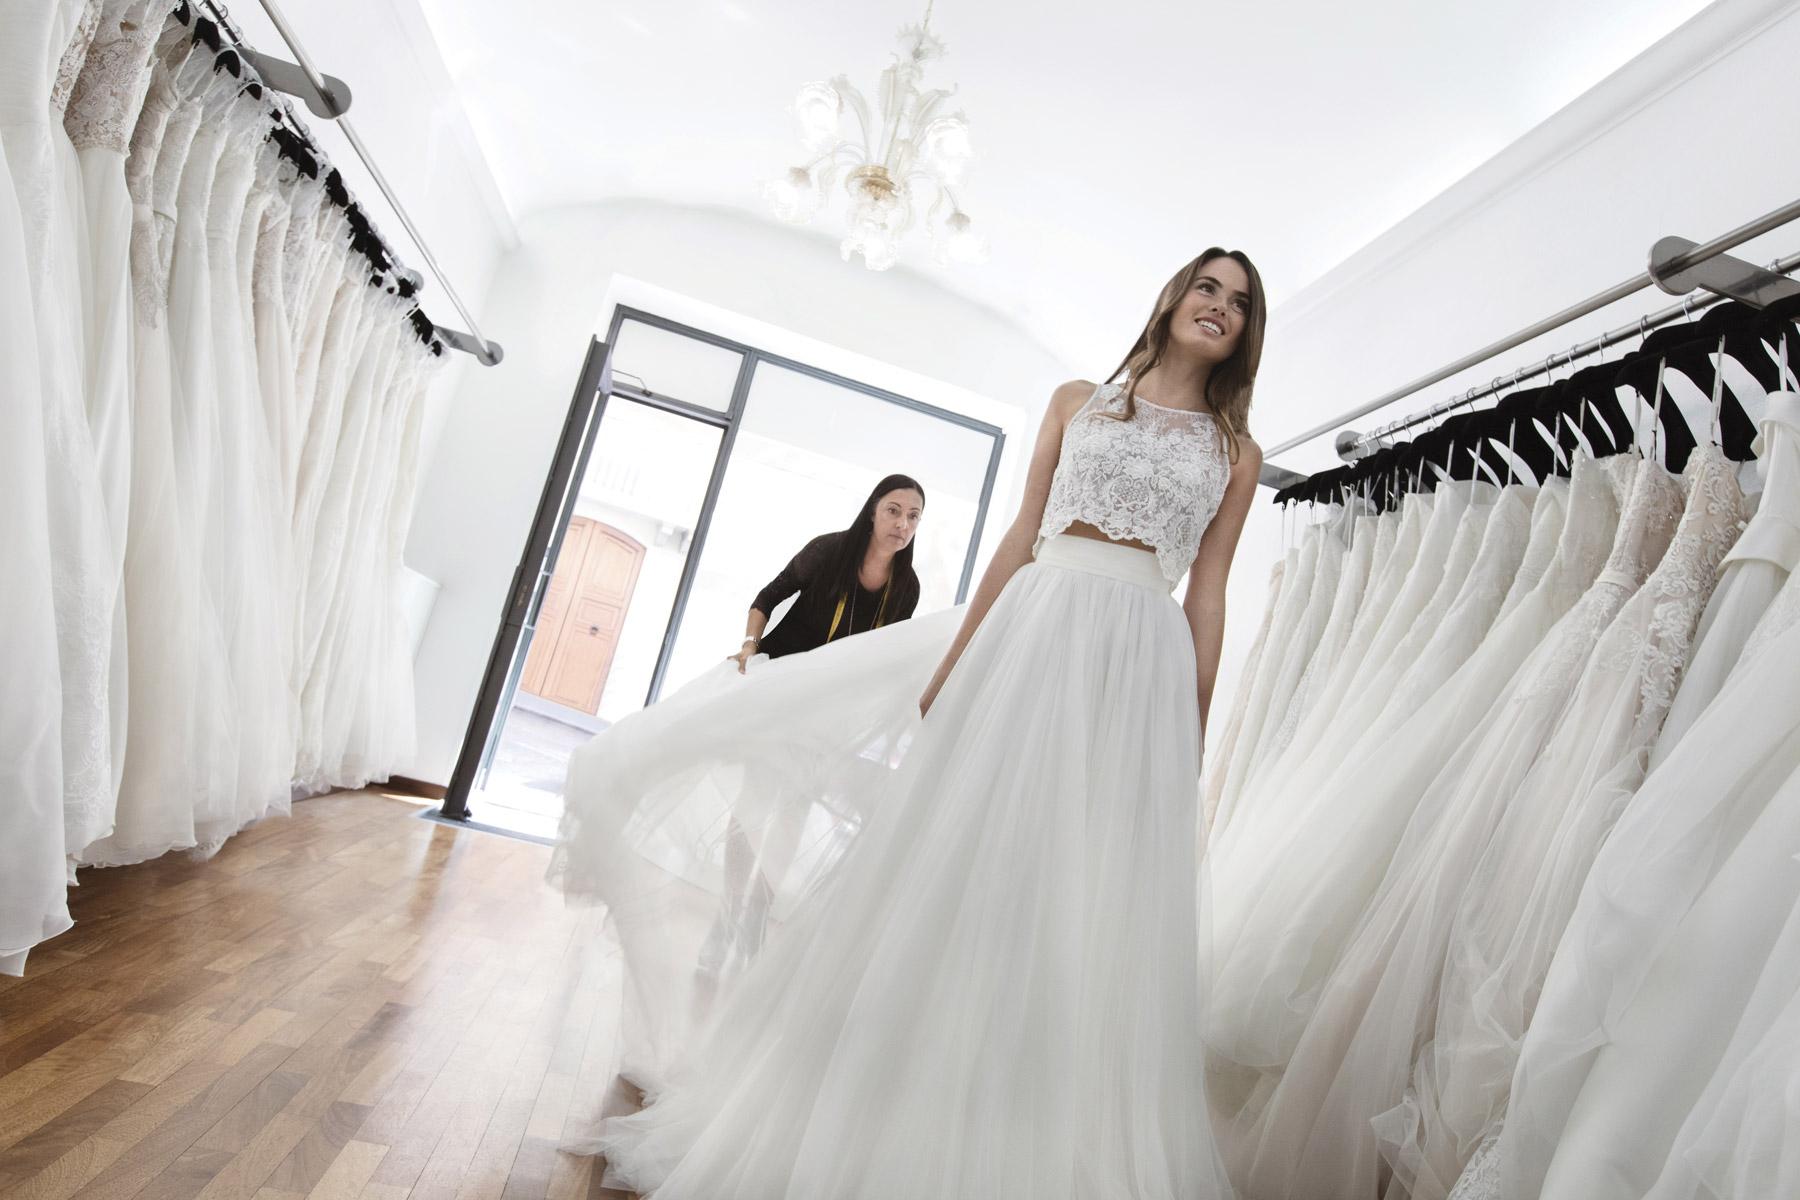 Abiti Da Sposa Parma.Stefania Spose Parma Abiti Da Sposa Parma